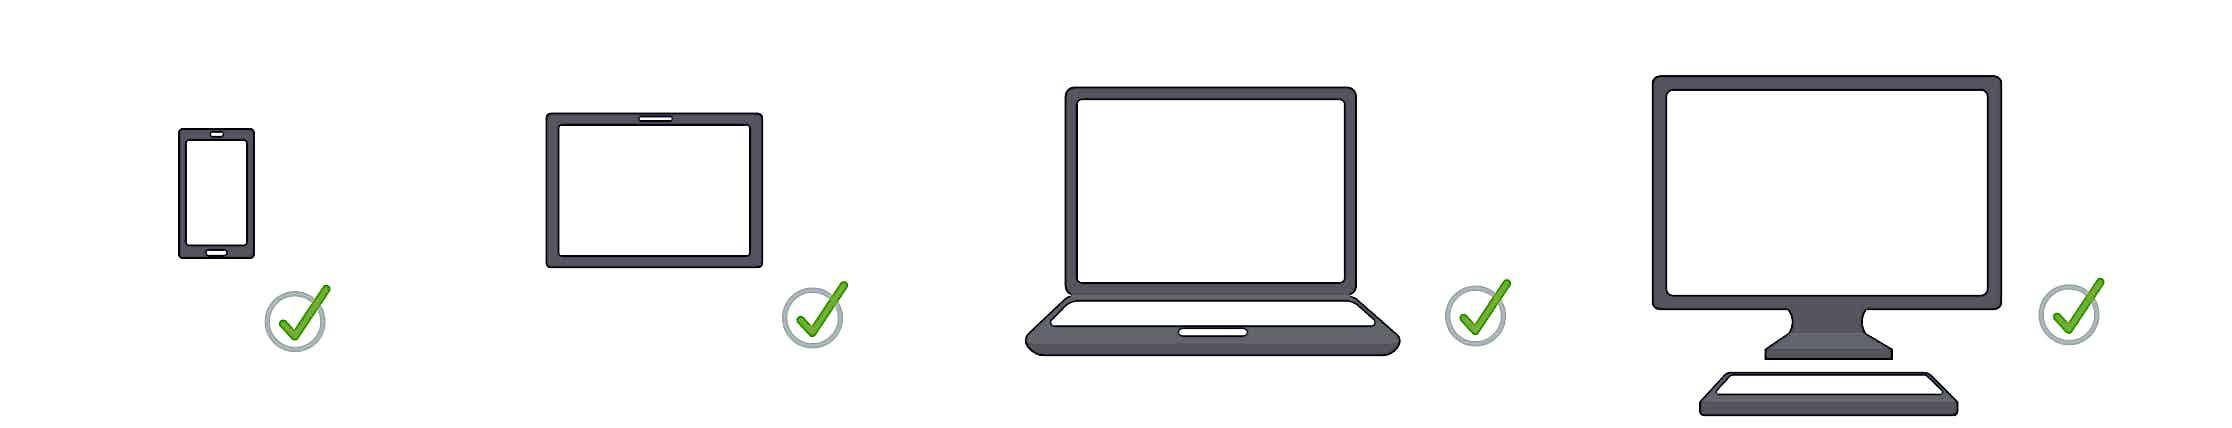 device handy ipad laptop